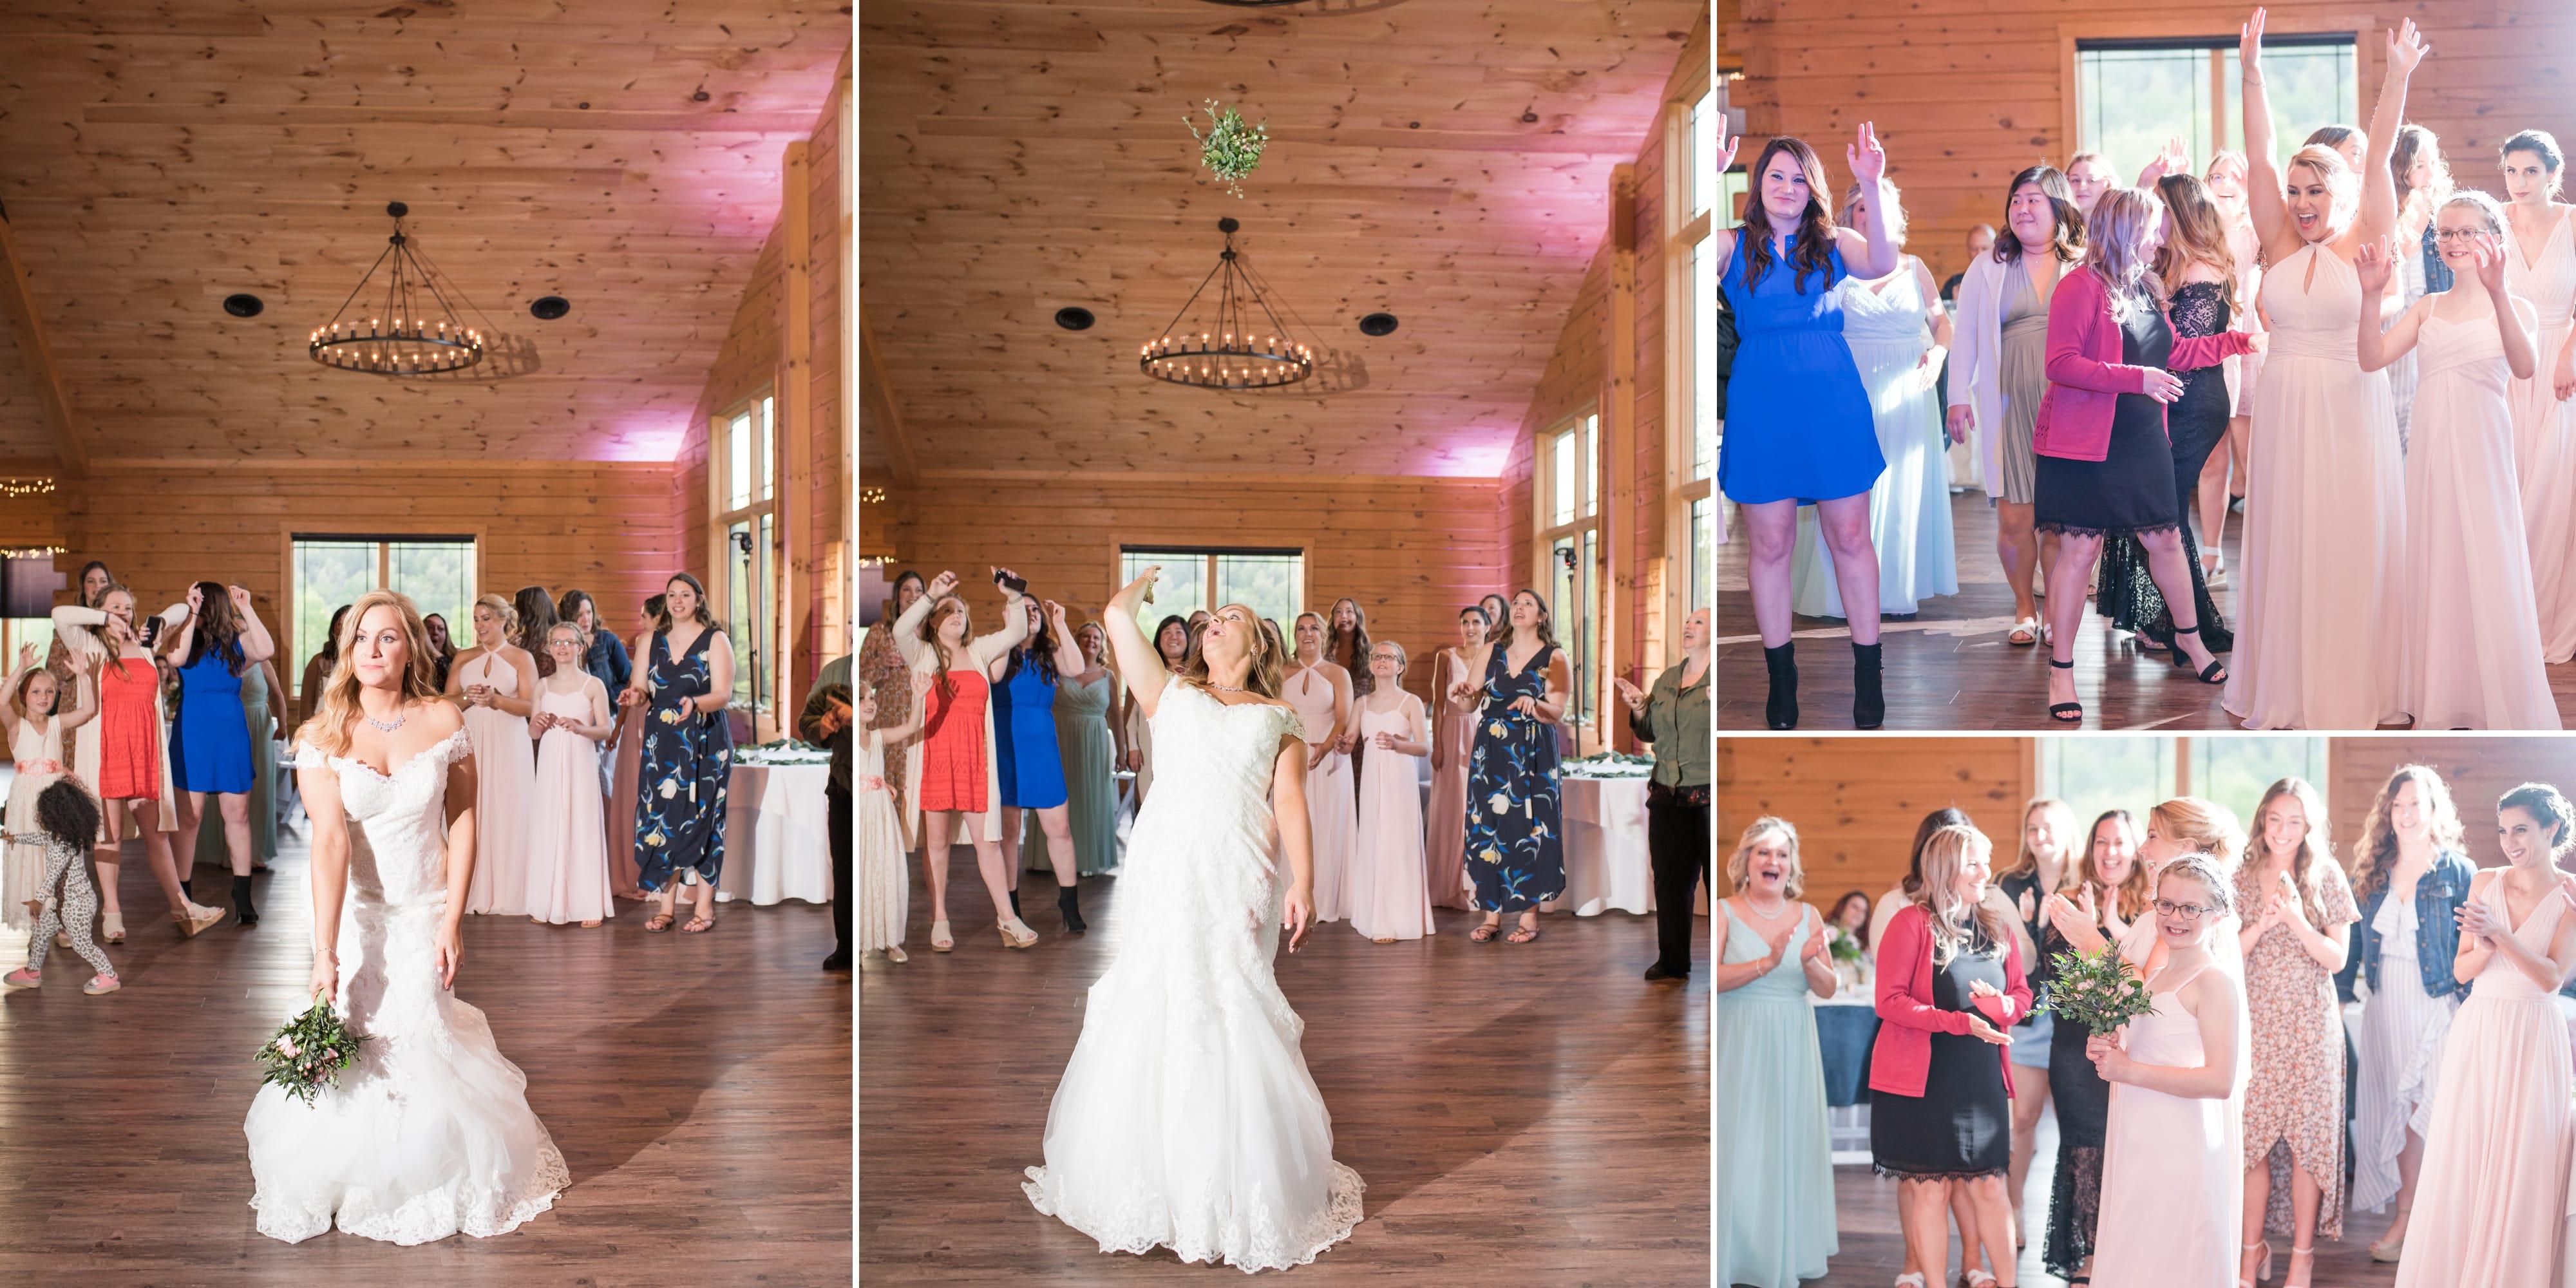 Bouquet toss at Rolling Rails Lodge wedding reception